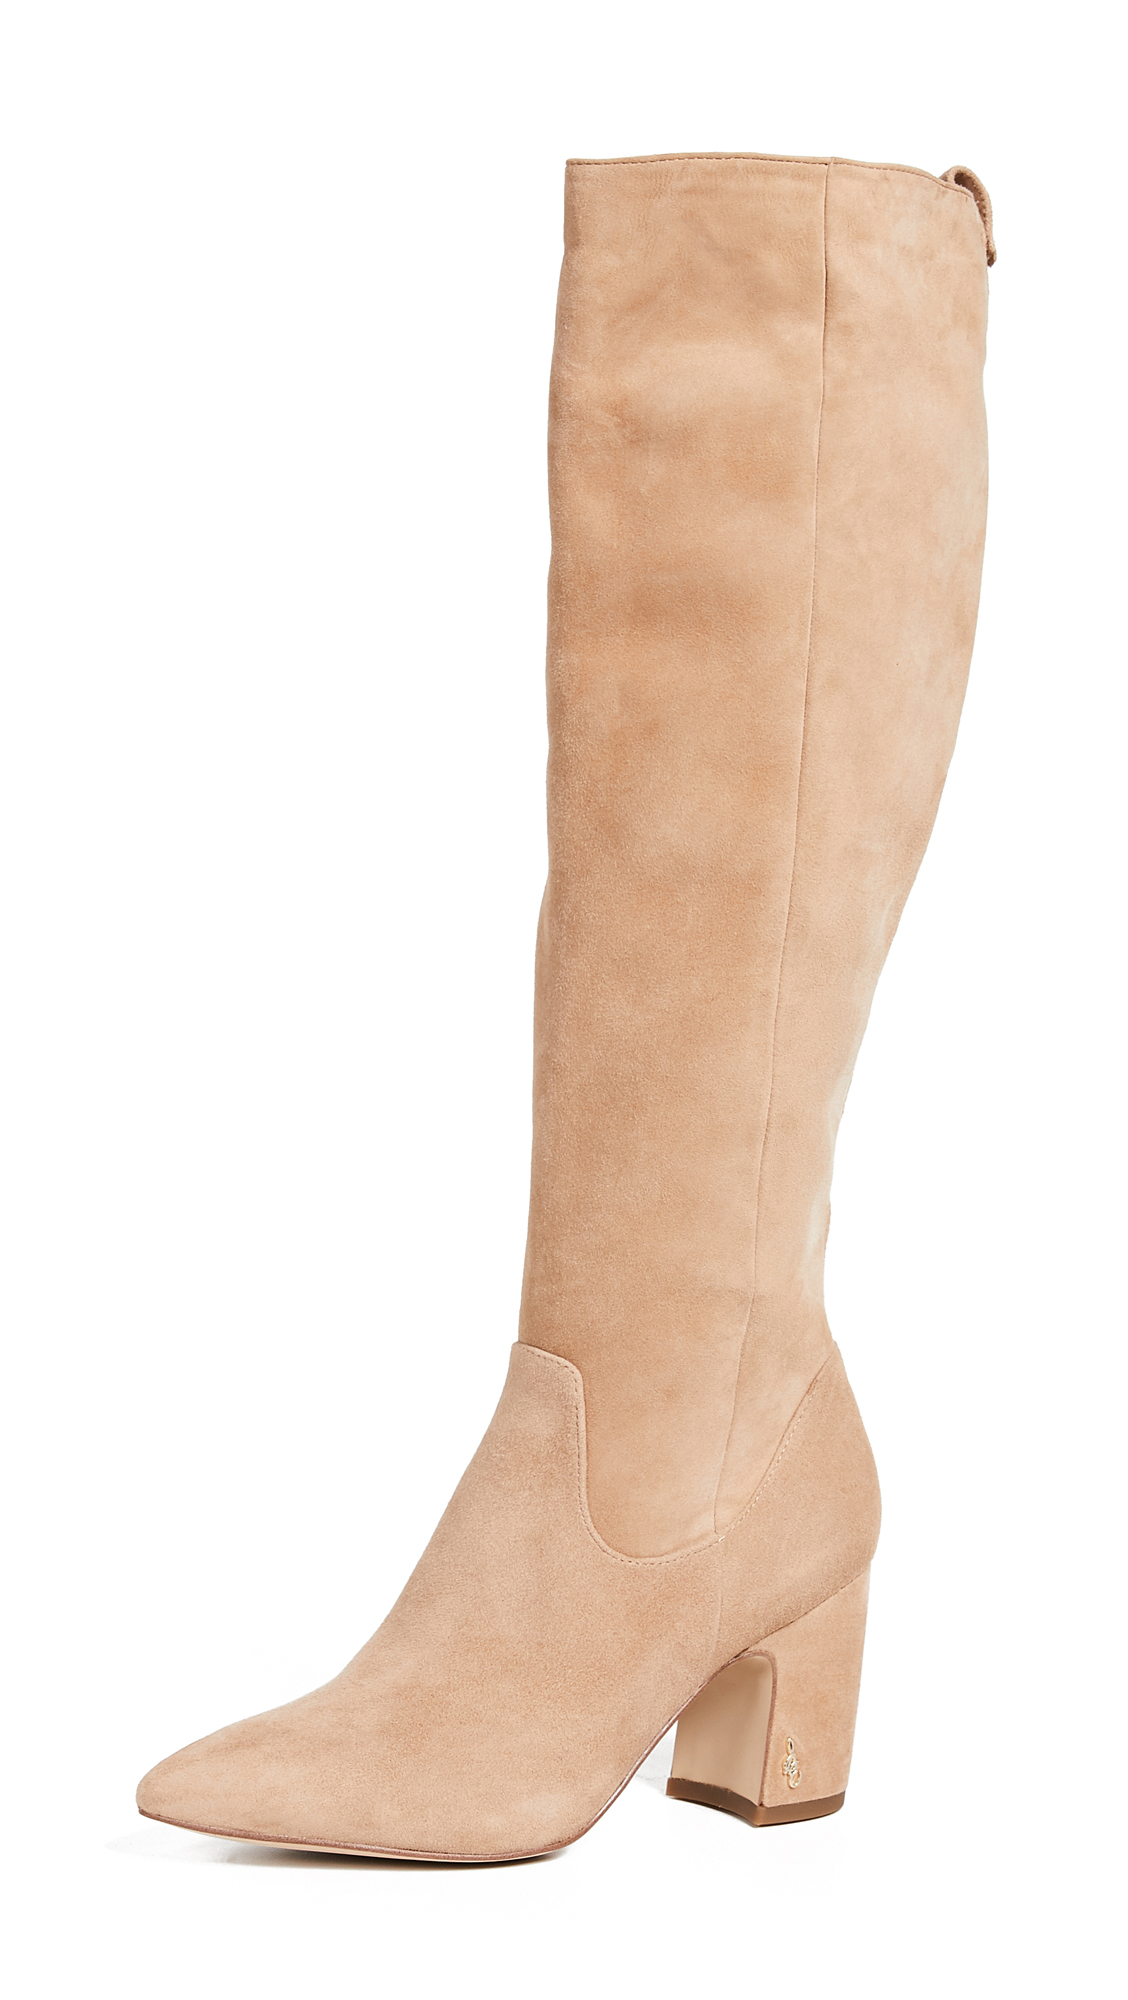 Sam Edelman Hai Tall Boots - Golden Caramel